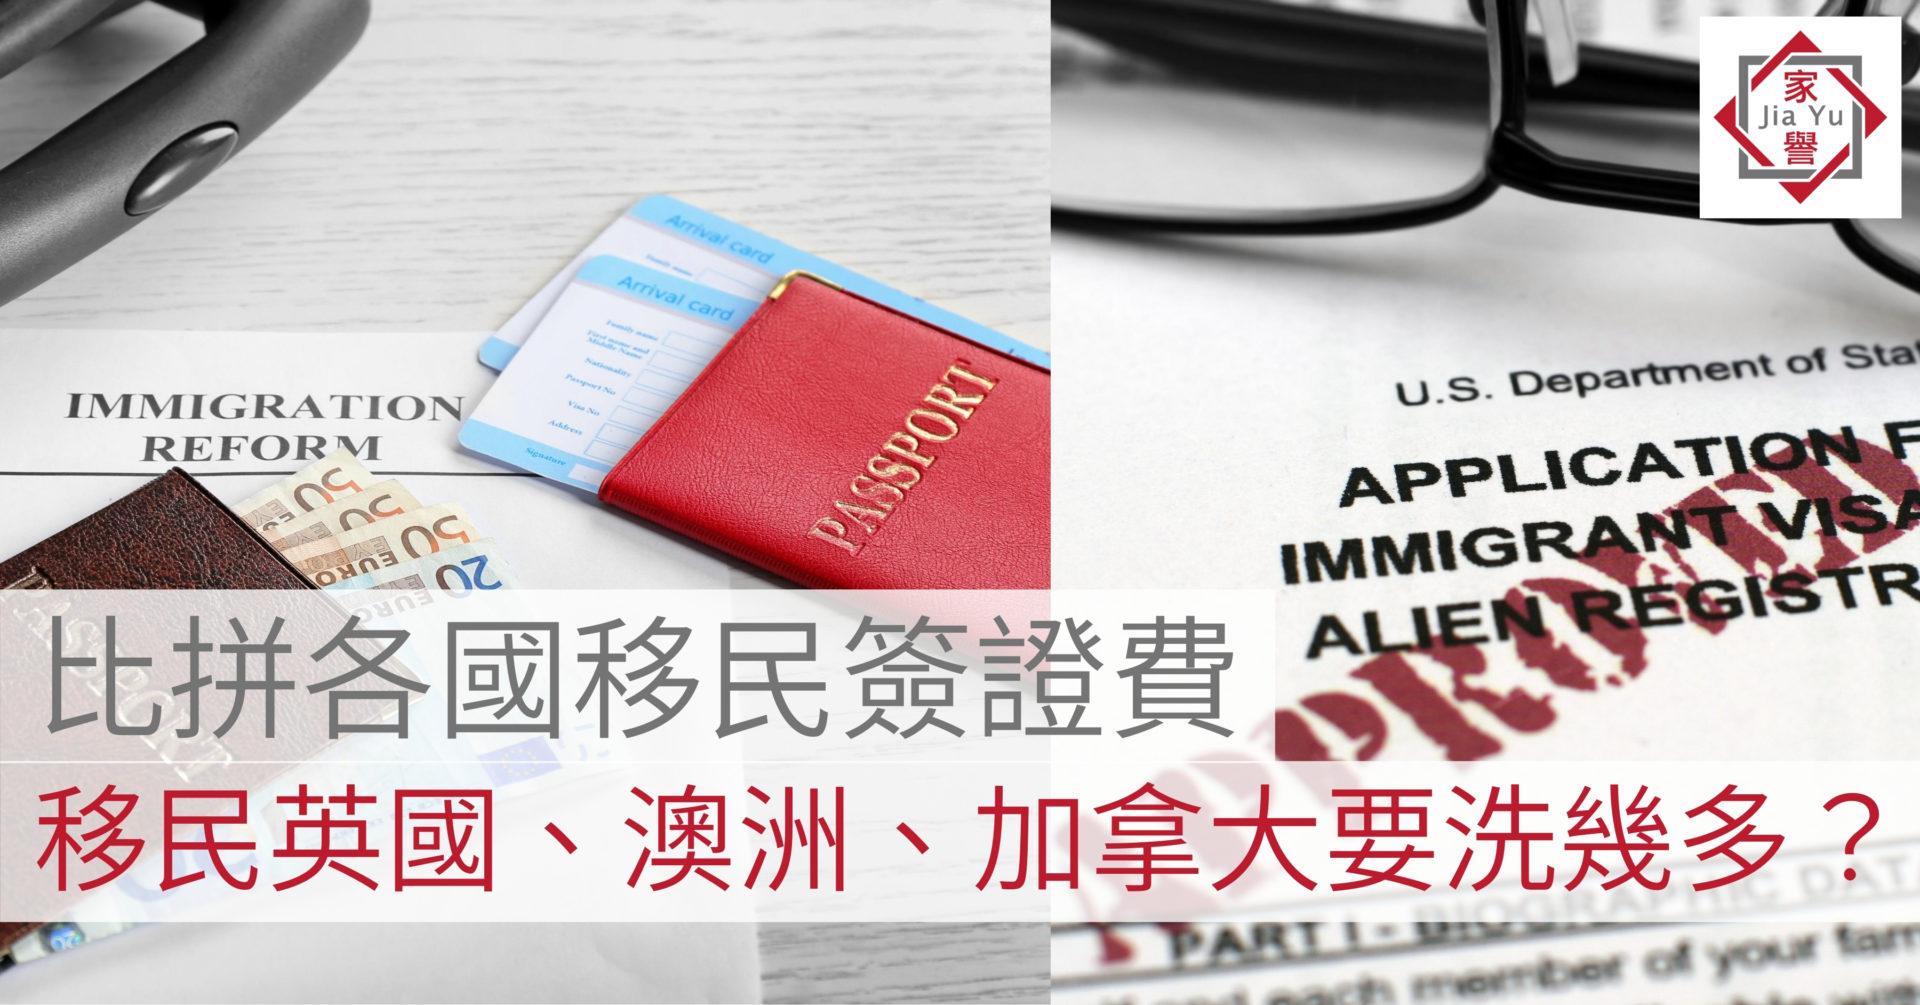 Visa fee for immigrants to Britain, Australia and Canada cost | JiaYu